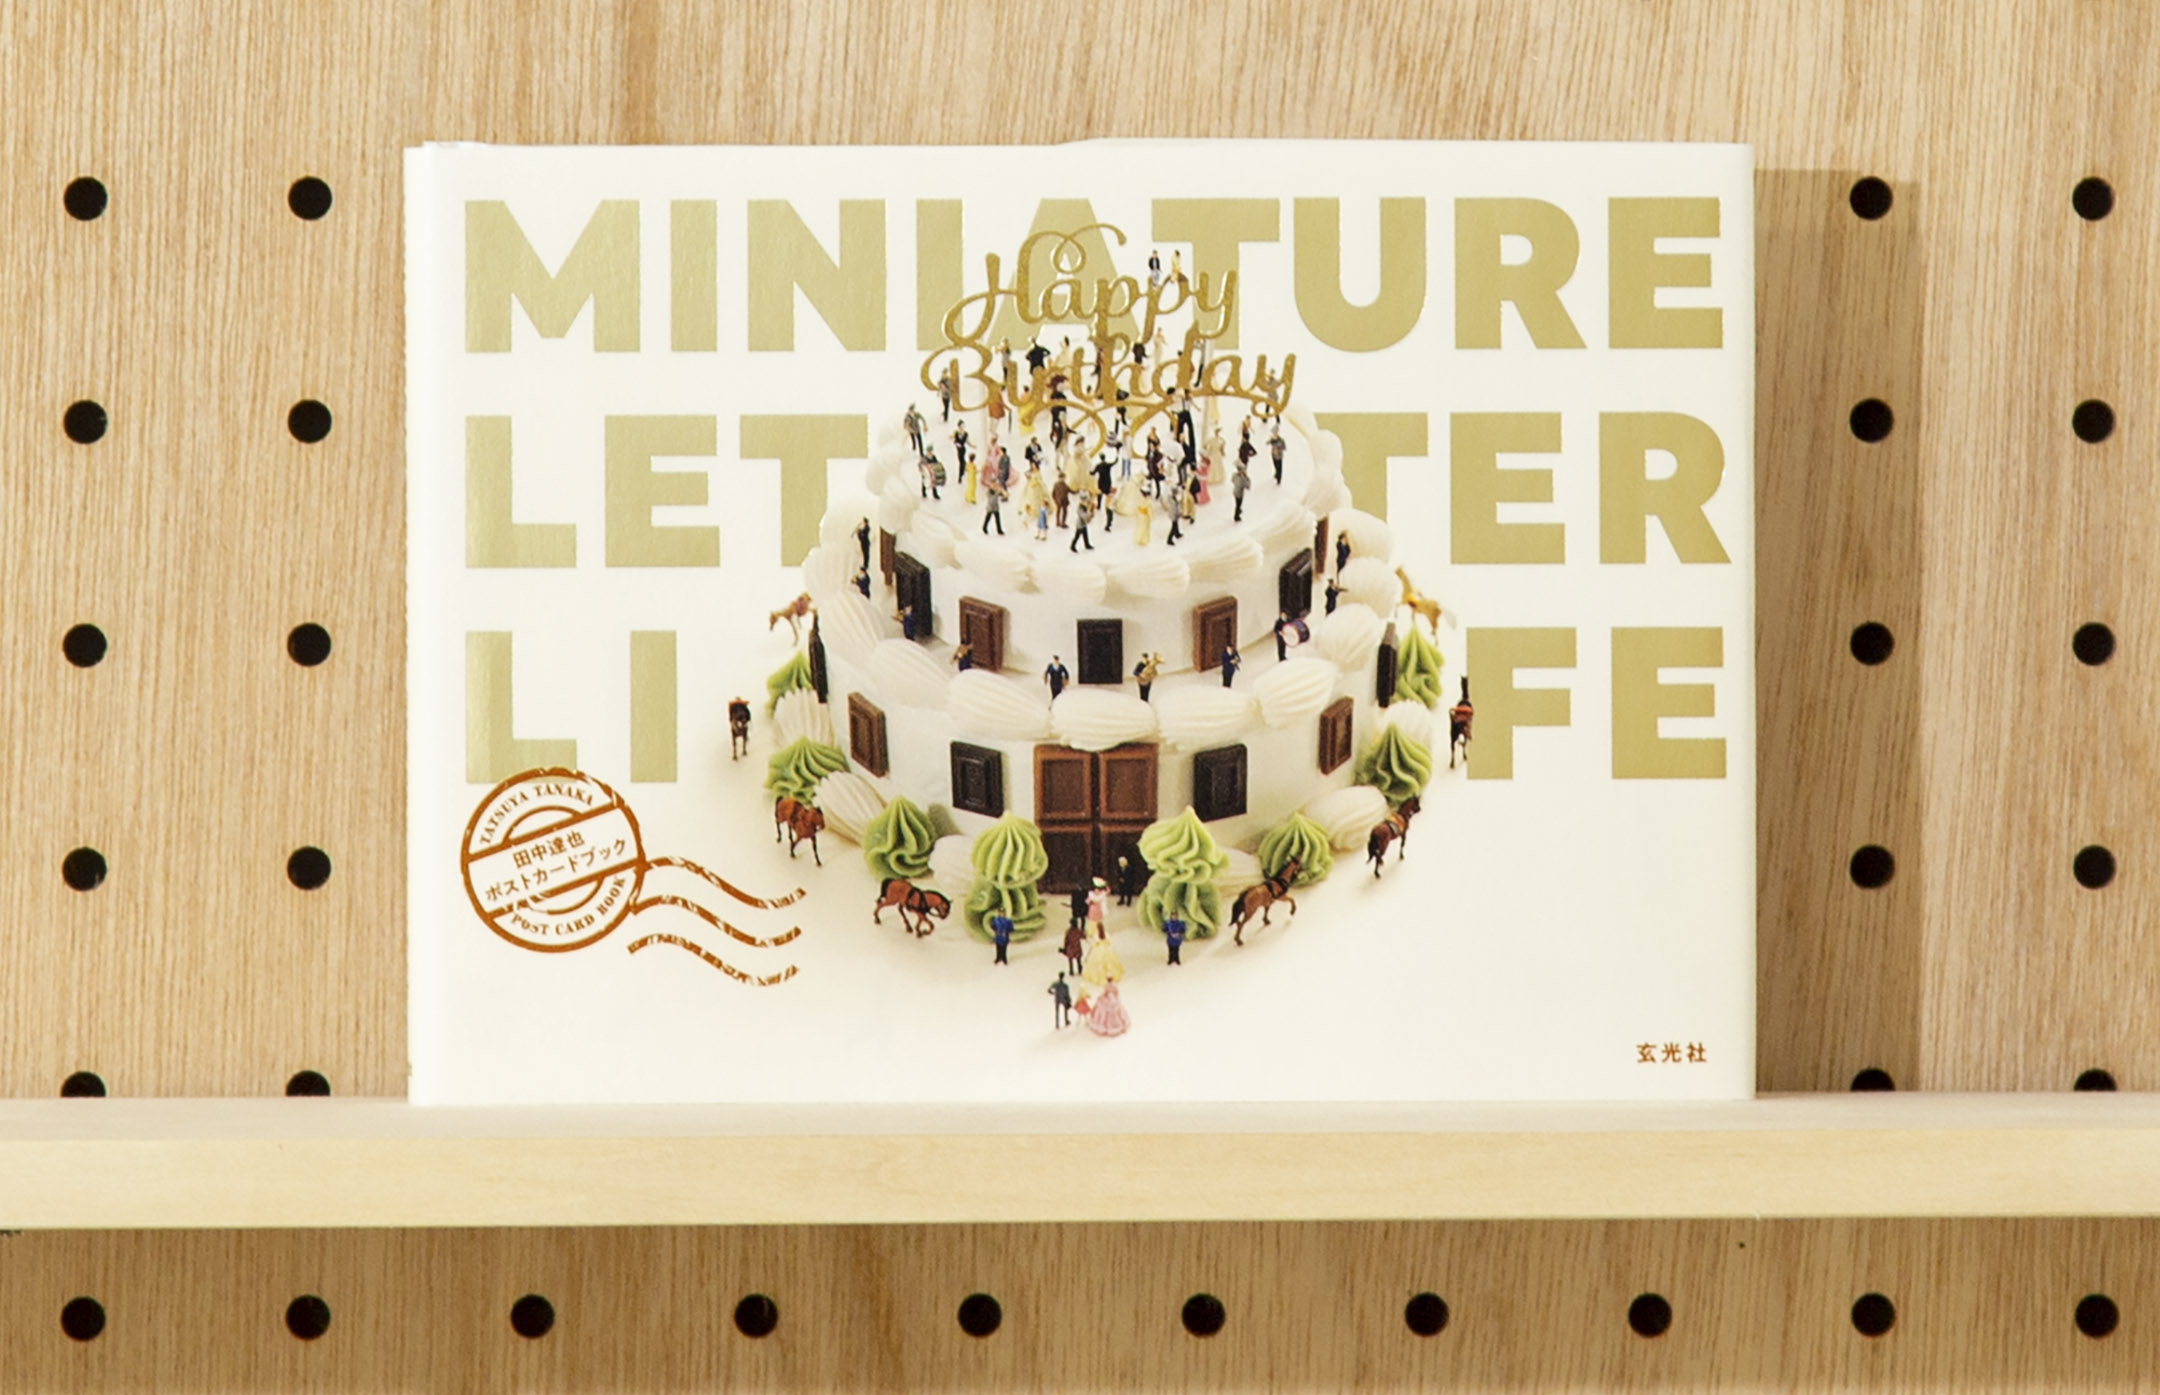 soda design 「MINIATURE LETTER LIFE 田中達也ポストカードブック」